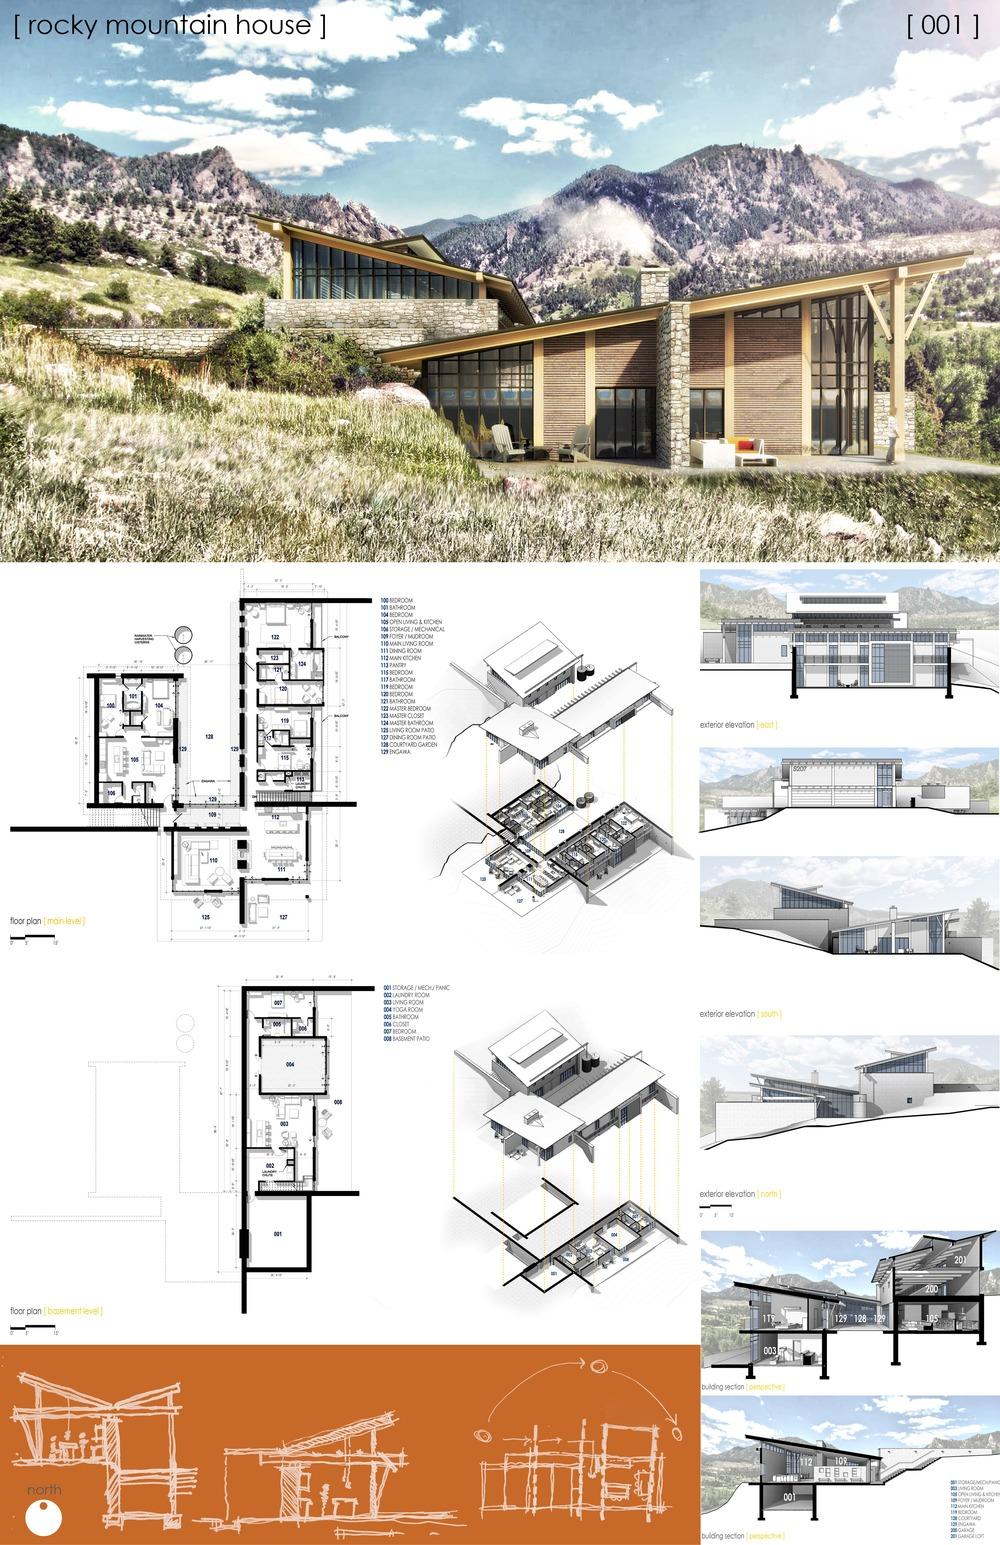 studiobad architects_jeffrey pinheiro_1of2.jpg